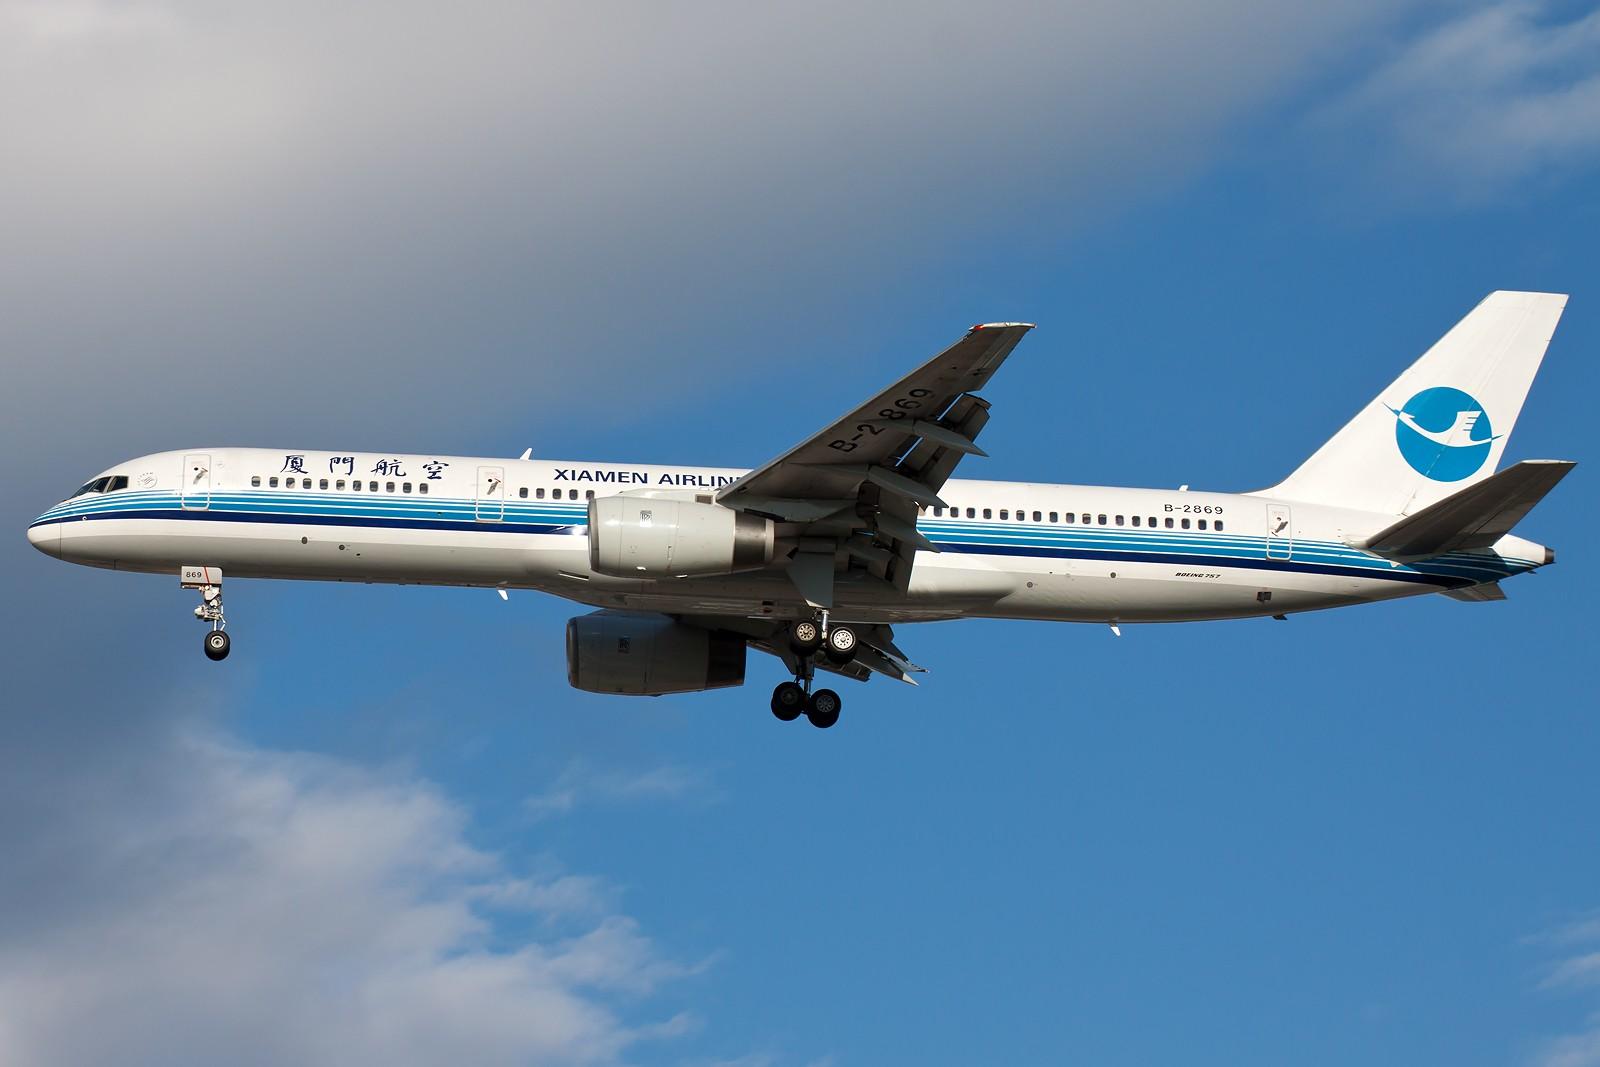 Re:[原创]求好天儿... [10pics] BOEING 757-200 B-2869 中国北京首都国际机场